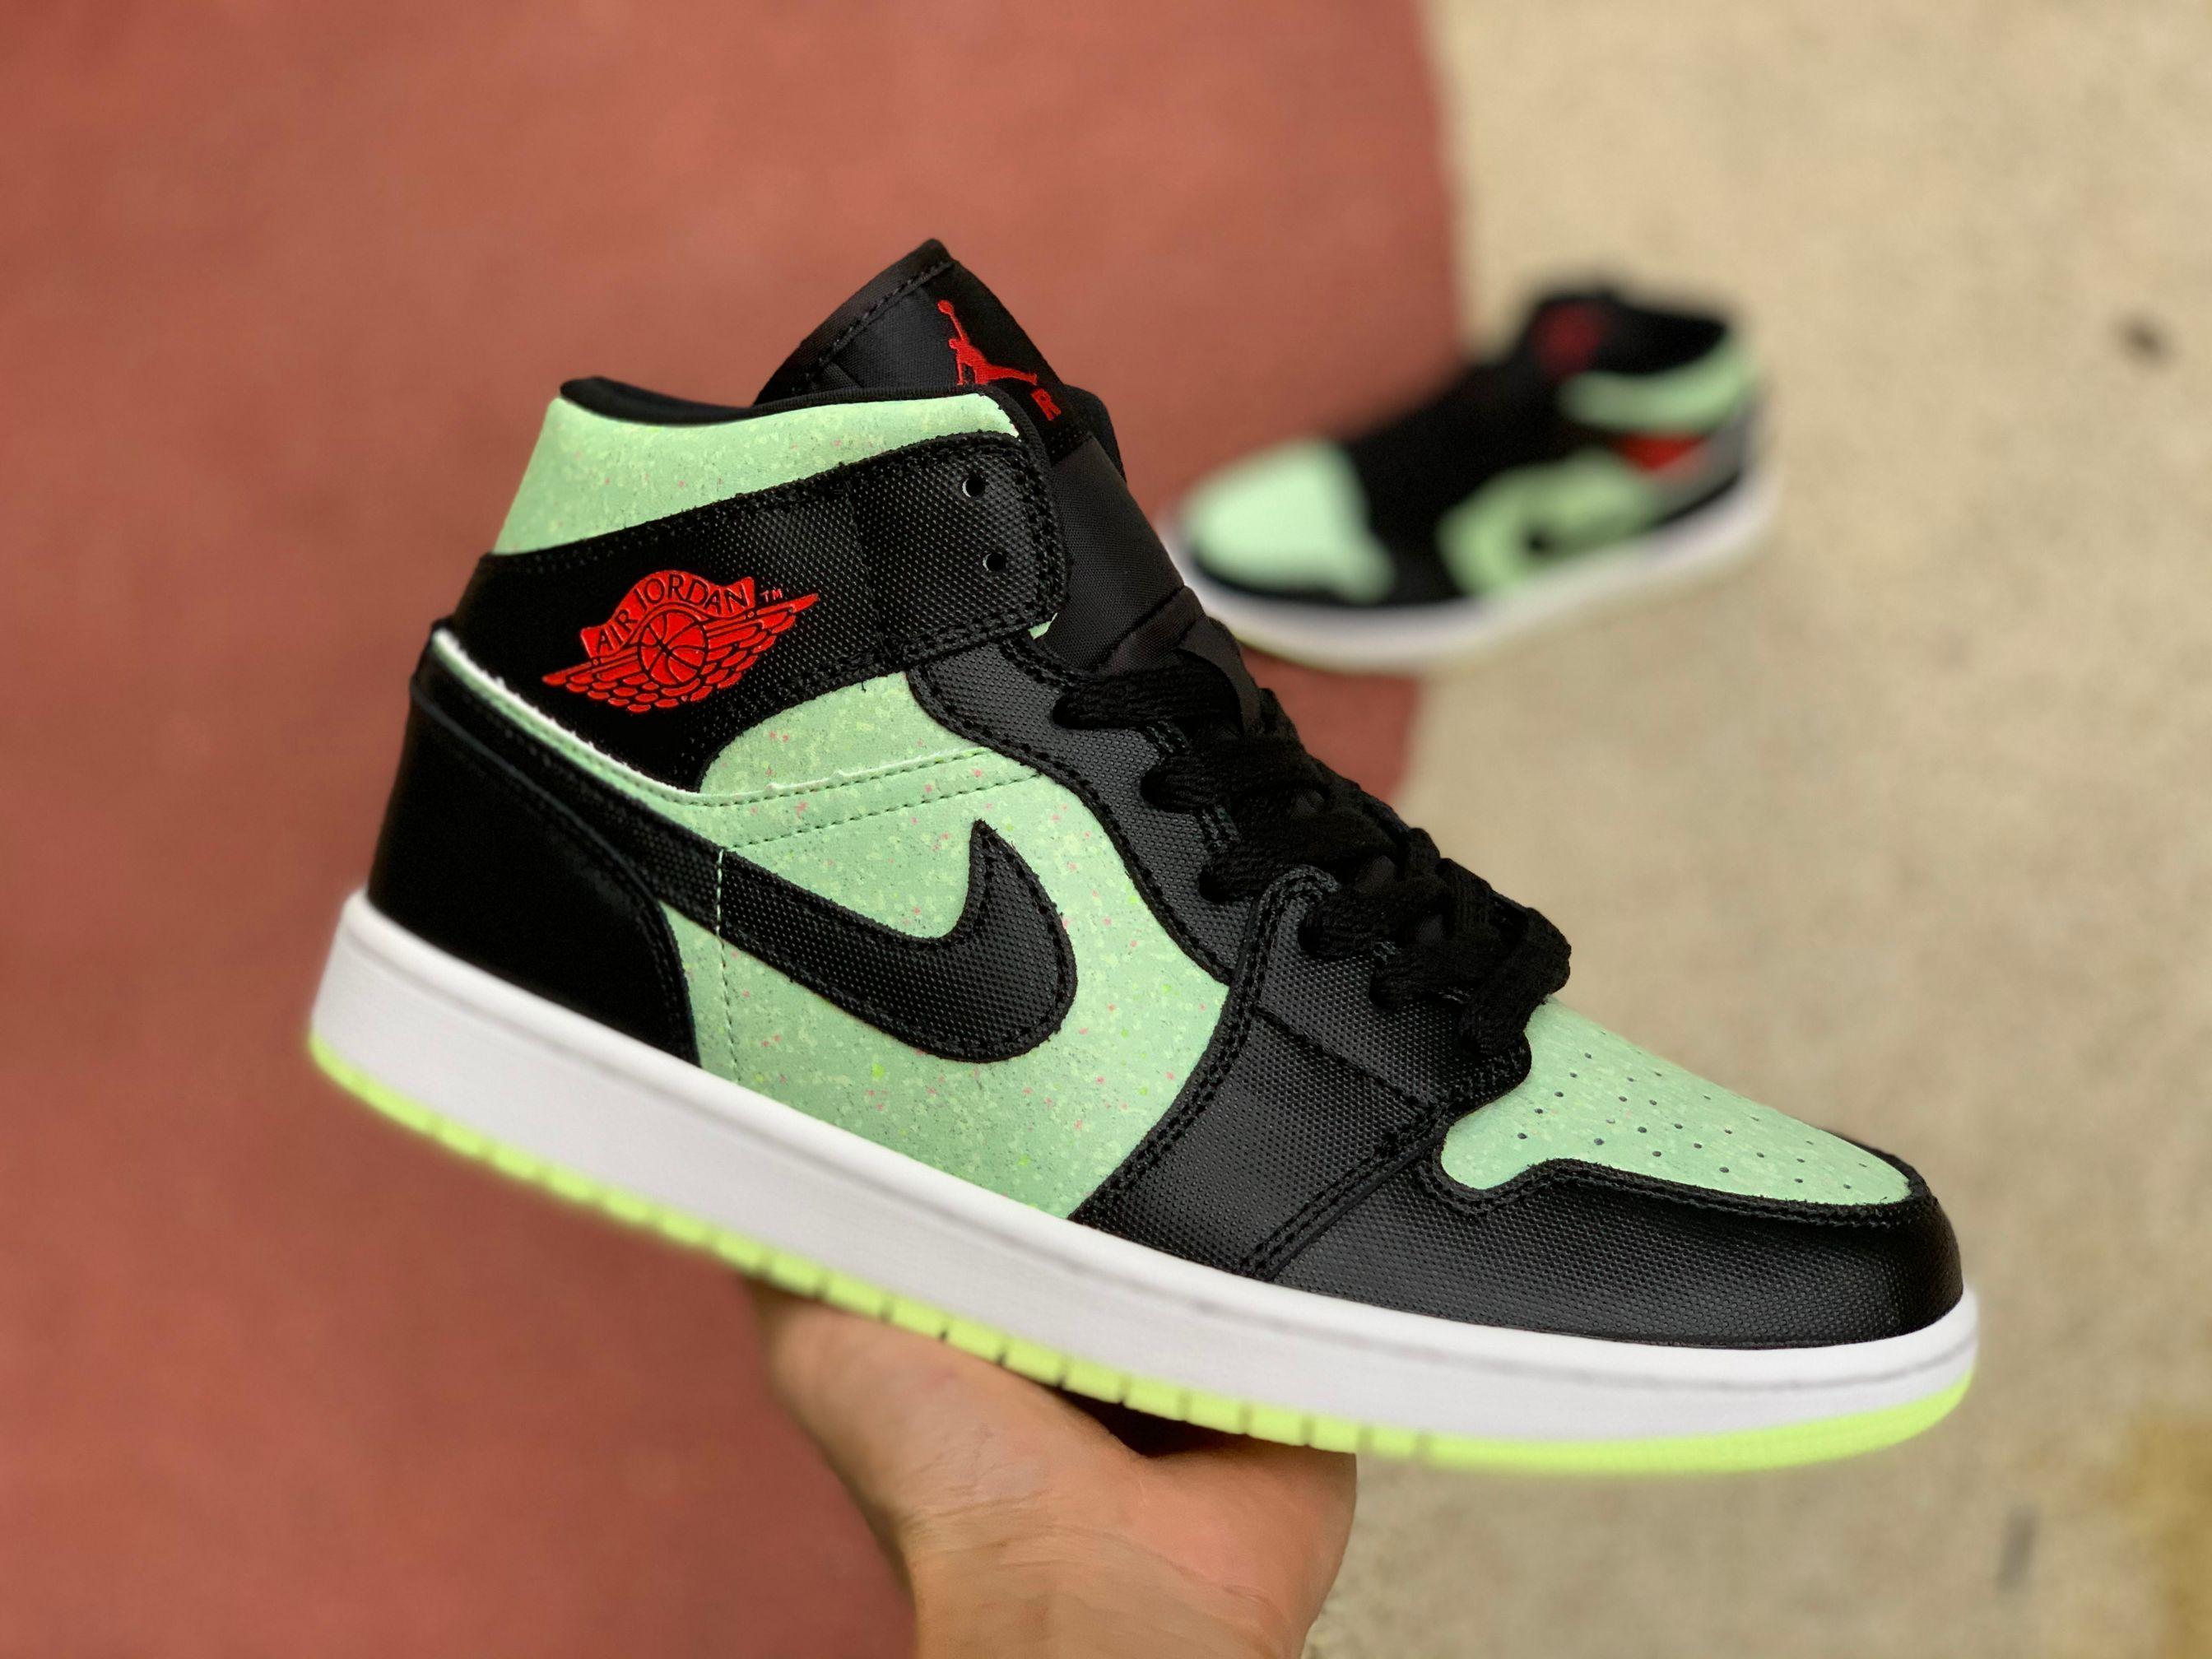 Latest Air Jordan 1 Mid Nike Grind